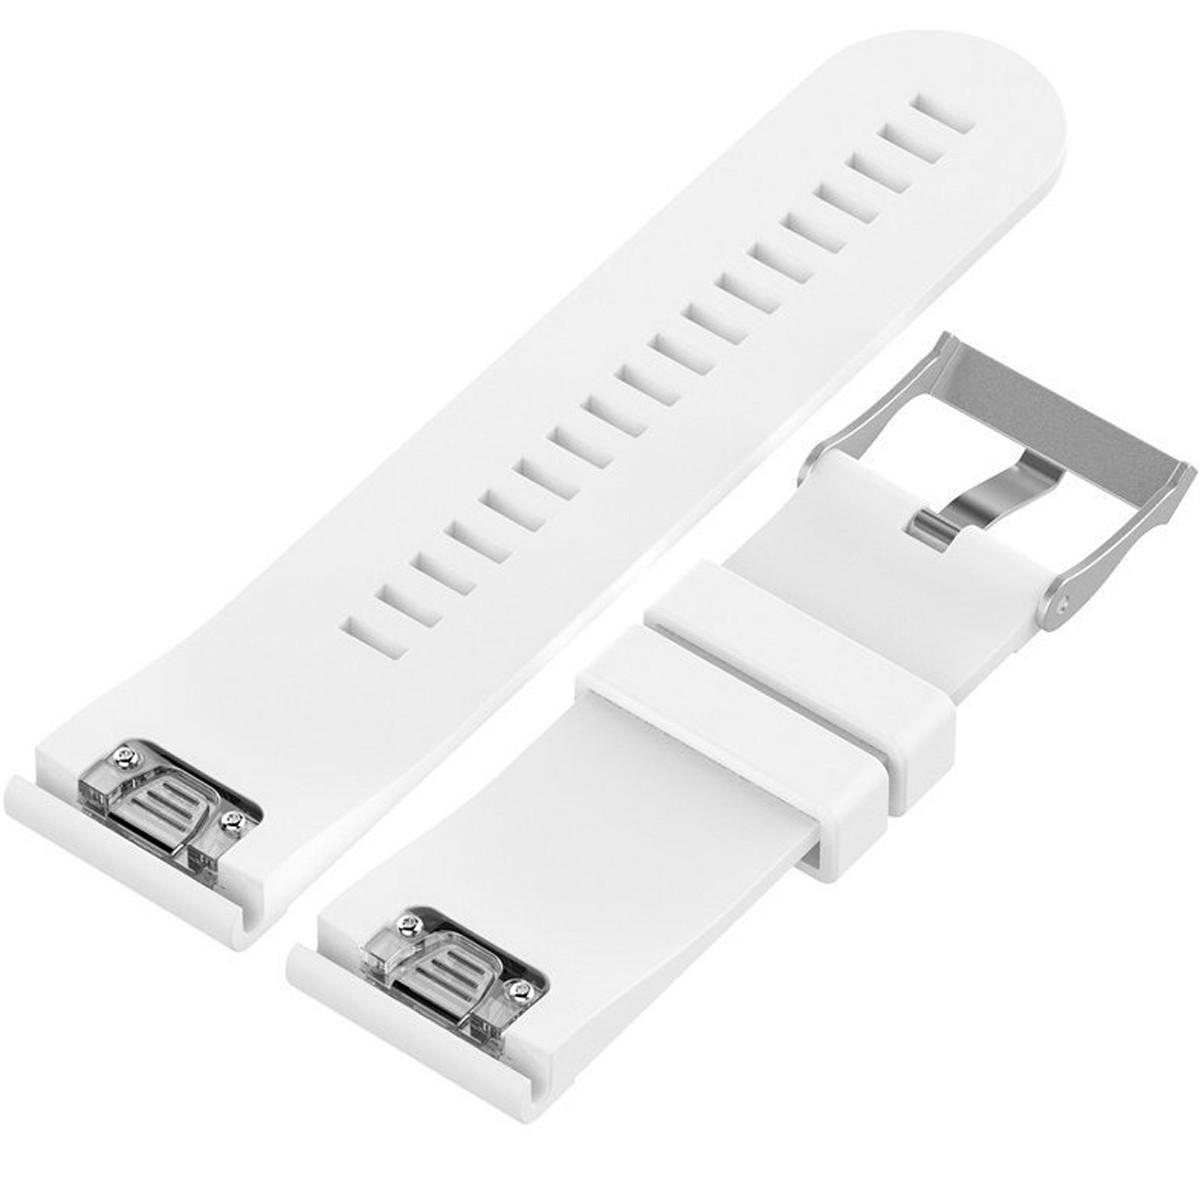 Curea Ceas Smartwatch Garmin Fenix 3 / Fenix 5x, 26 Mm Silicon Iuni White